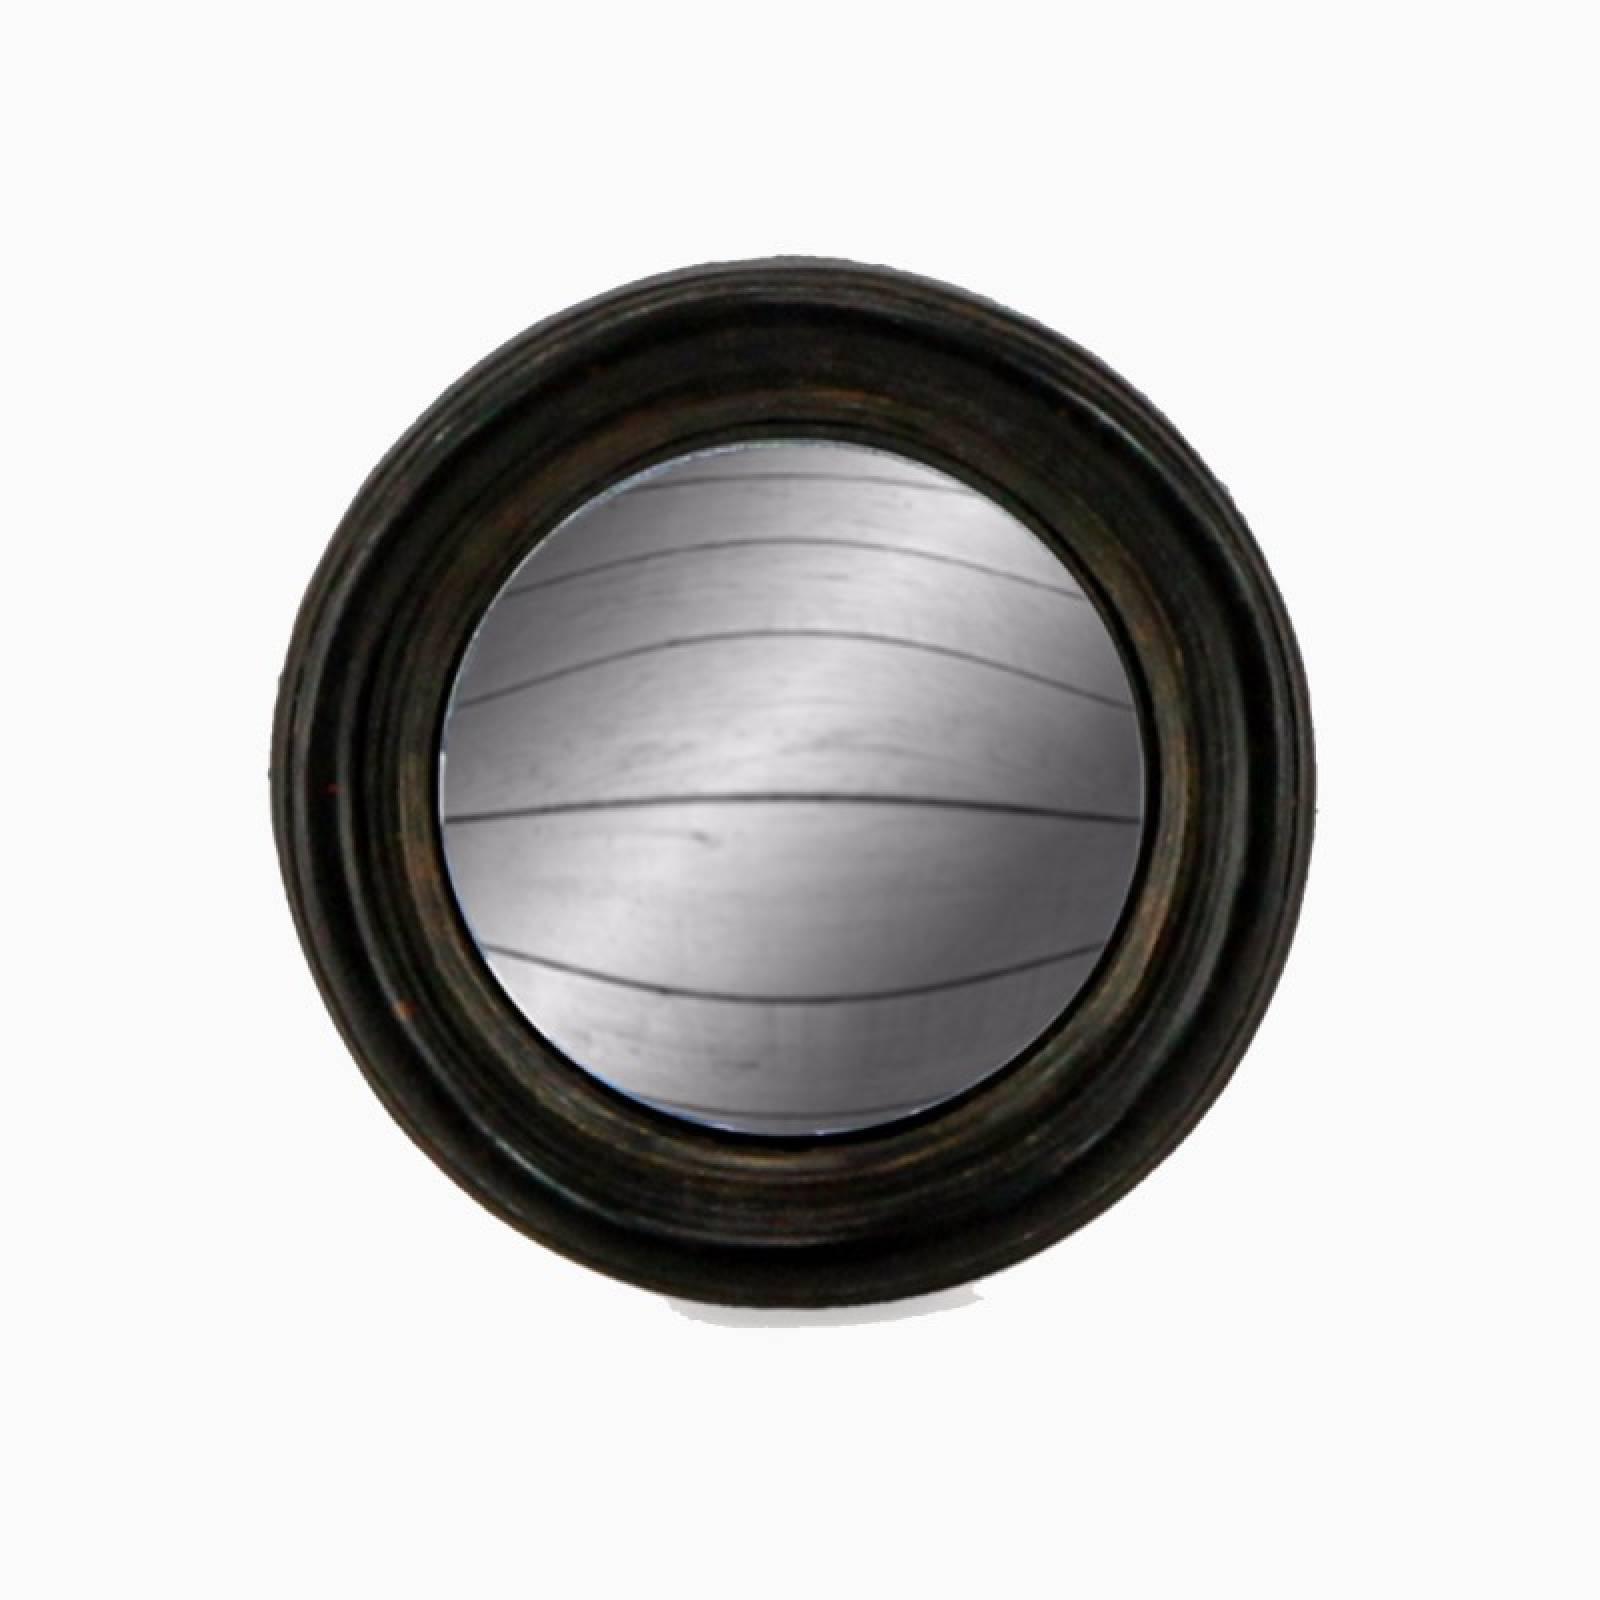 Antiqued Black Thin Framed Extra Small Convex Mirror D:9.5cm